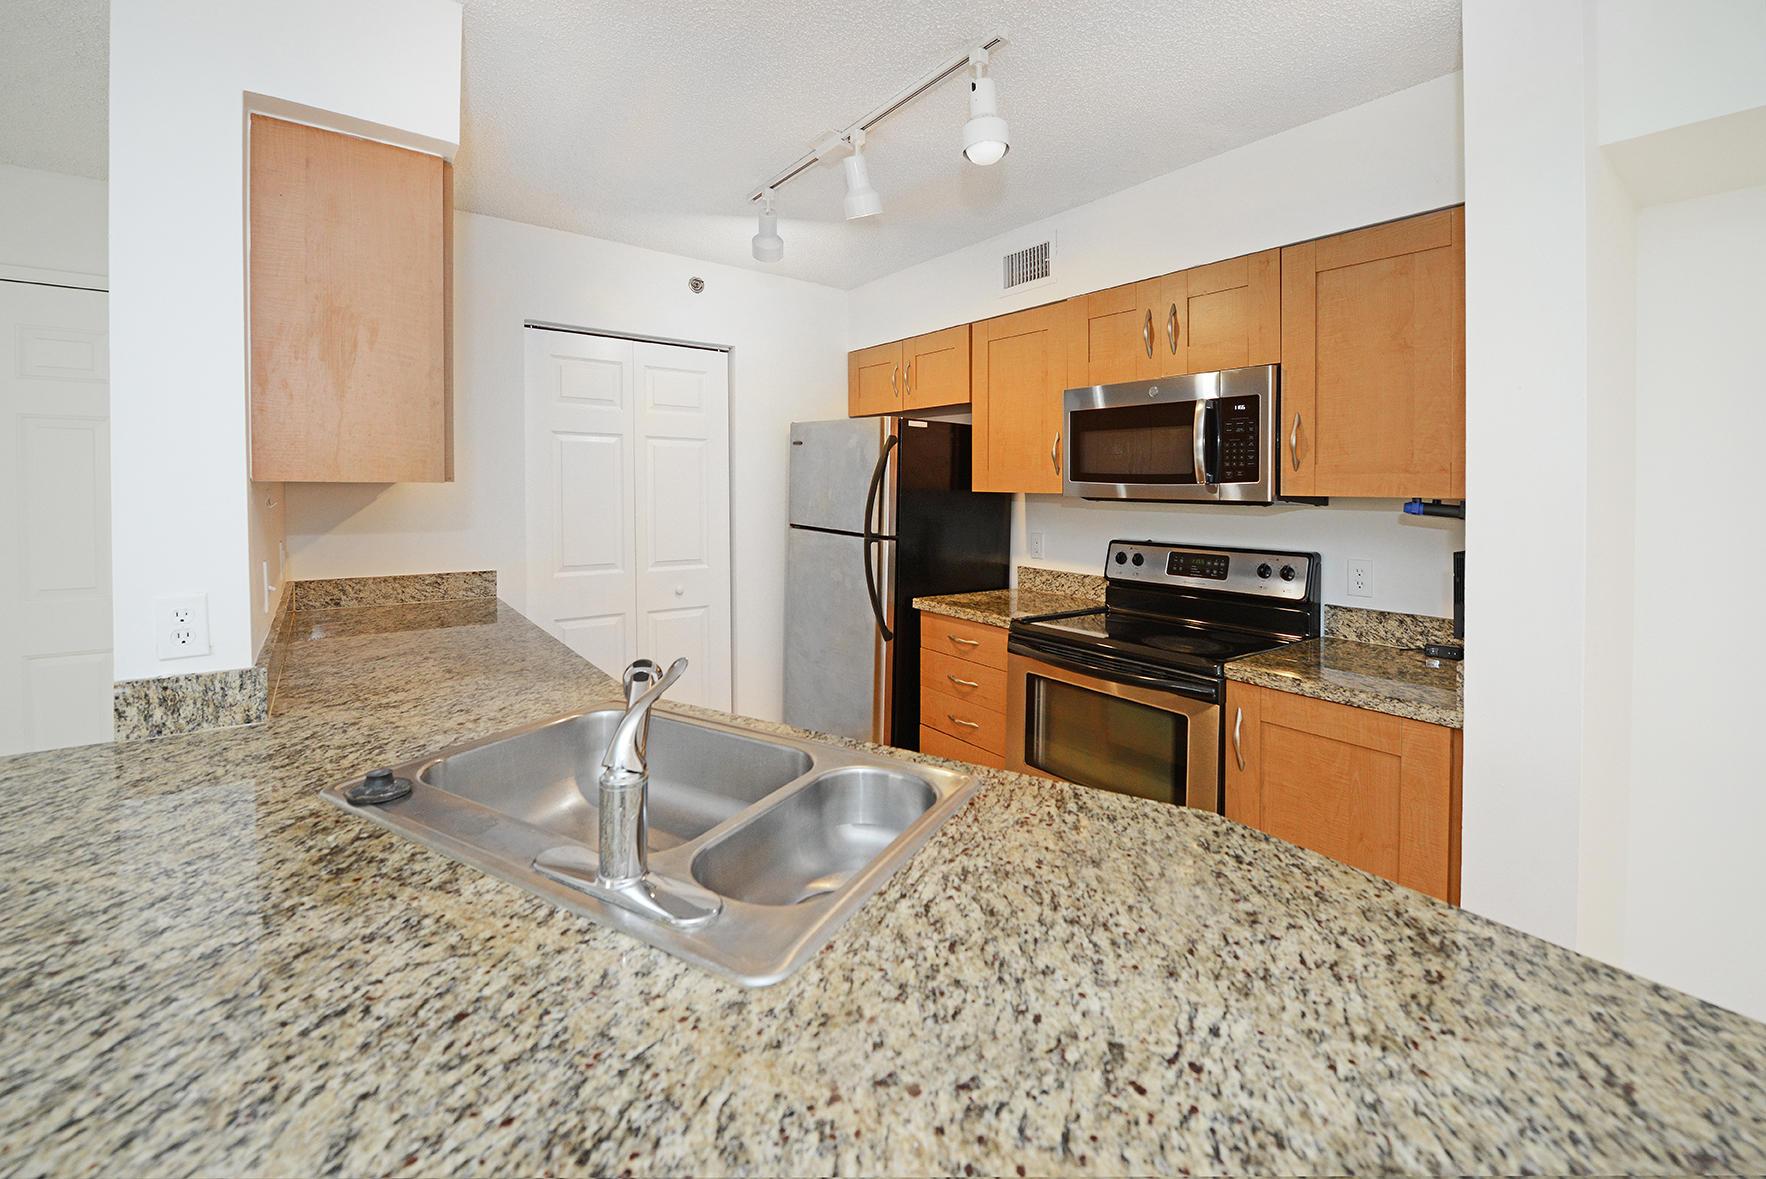 Home for sale in Bocar Boca Raton Florida